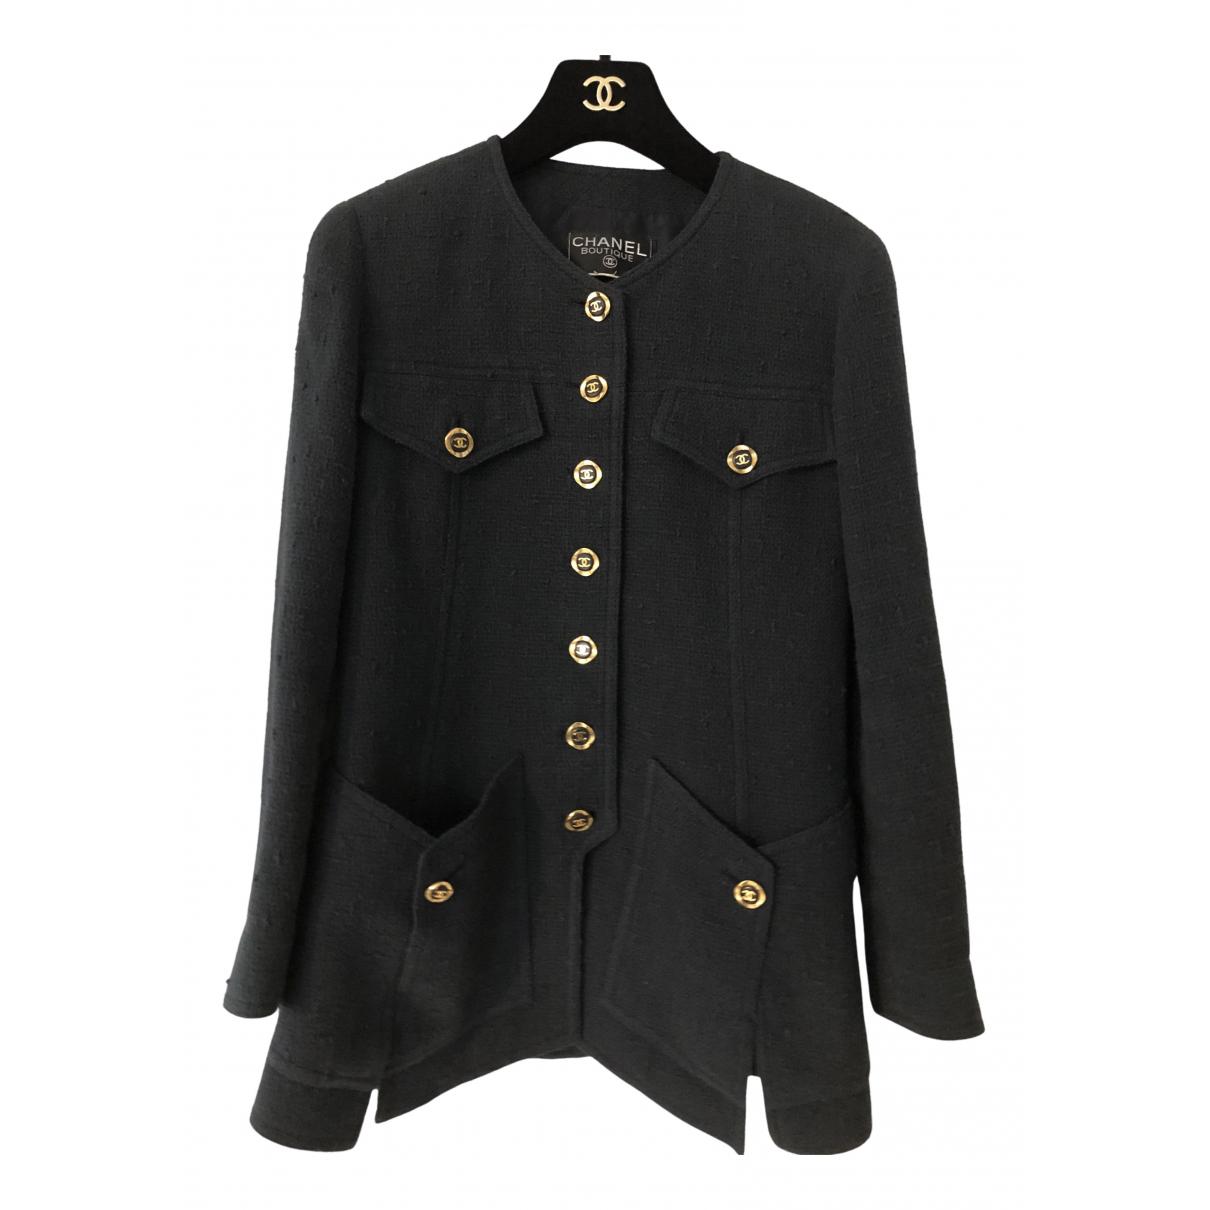 Chanel - Veste   pour femme en tweed - marine